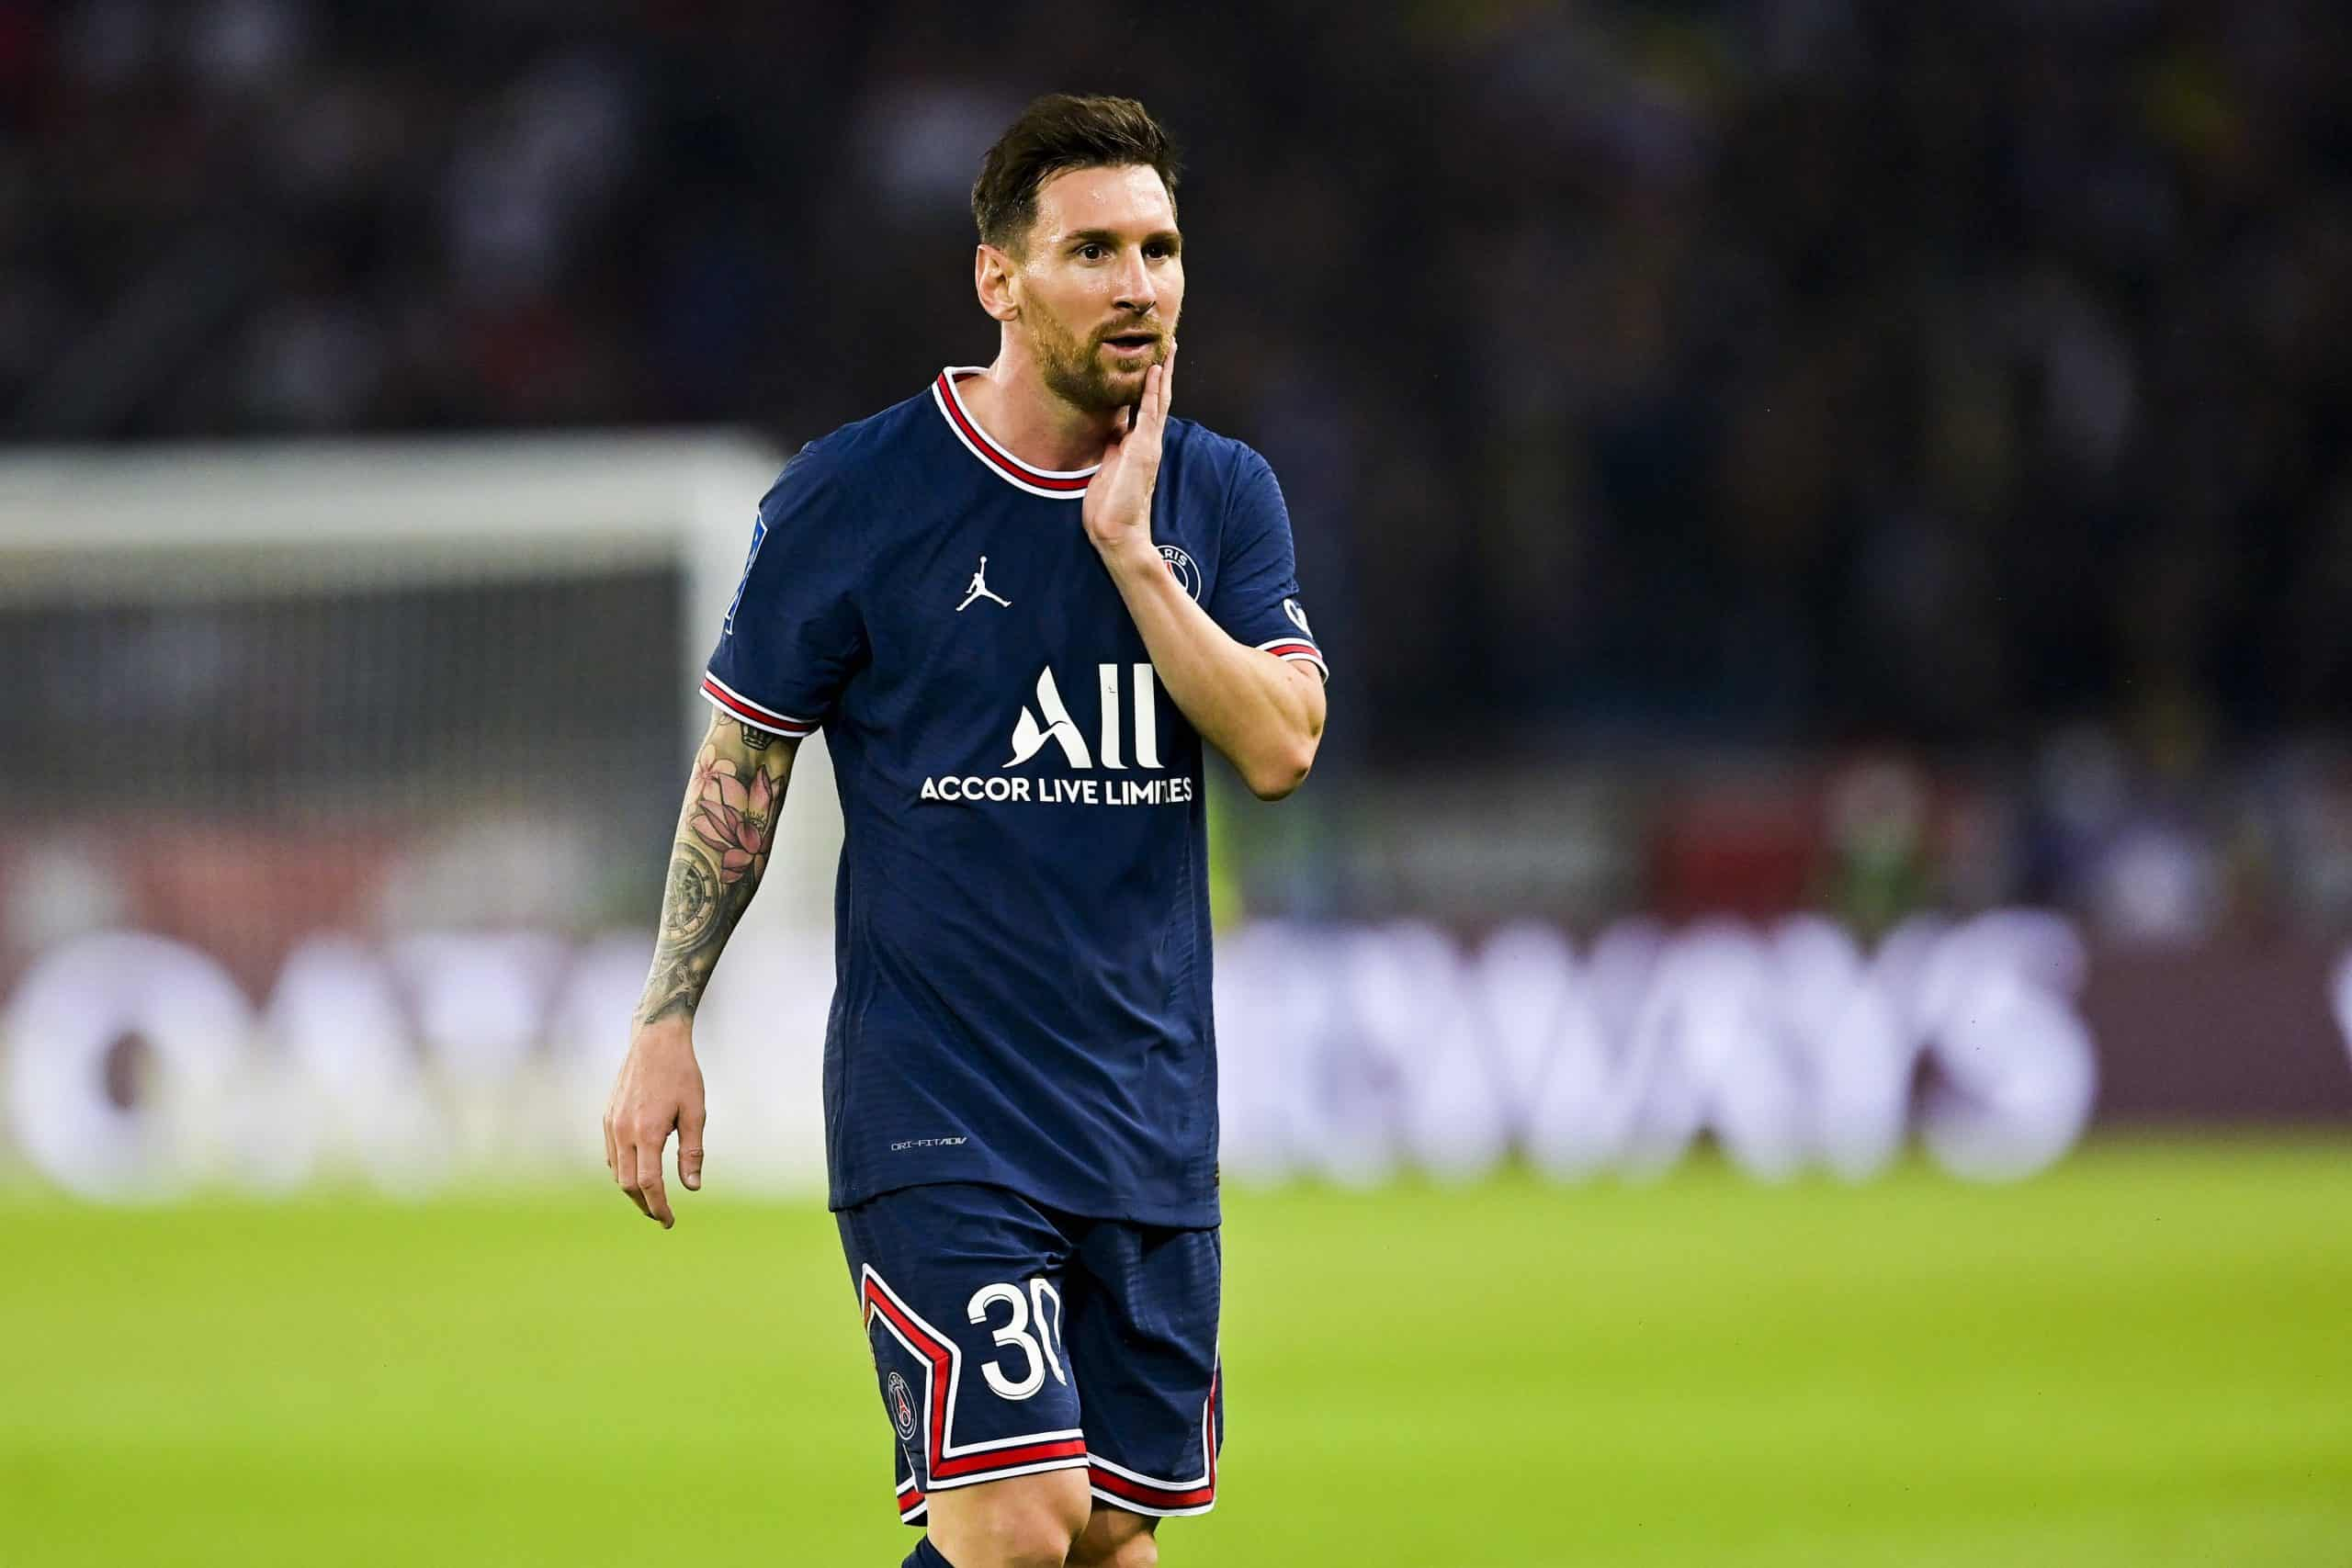 Messi se «marchita» en París según la prensa francesa